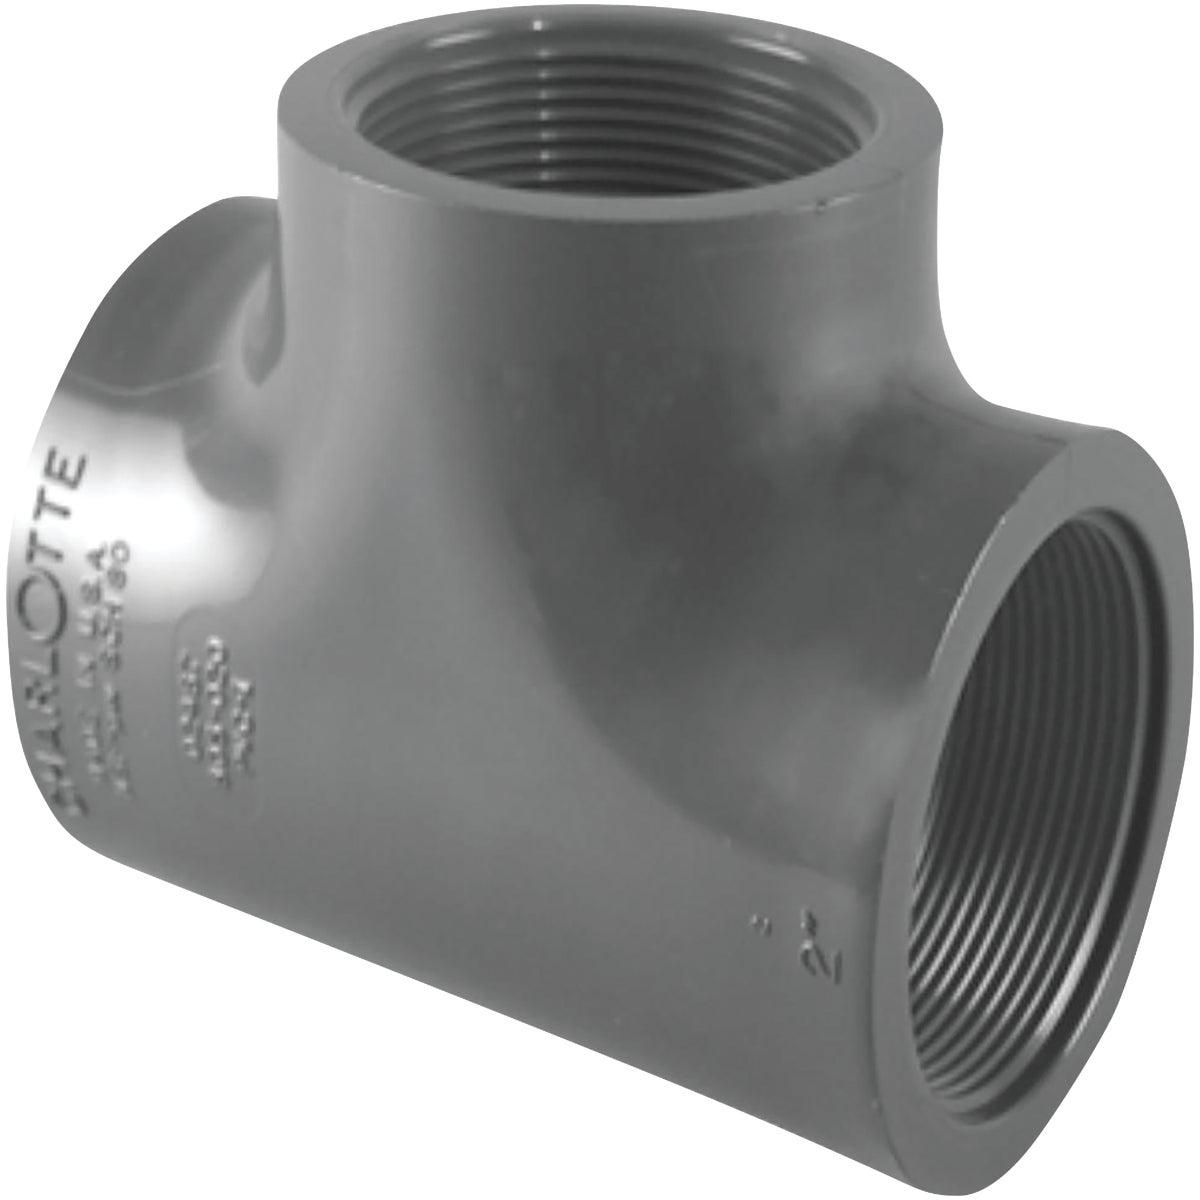 "1"" SCH80 PVC FXFXF TEE - 354588 by Genova Inc"